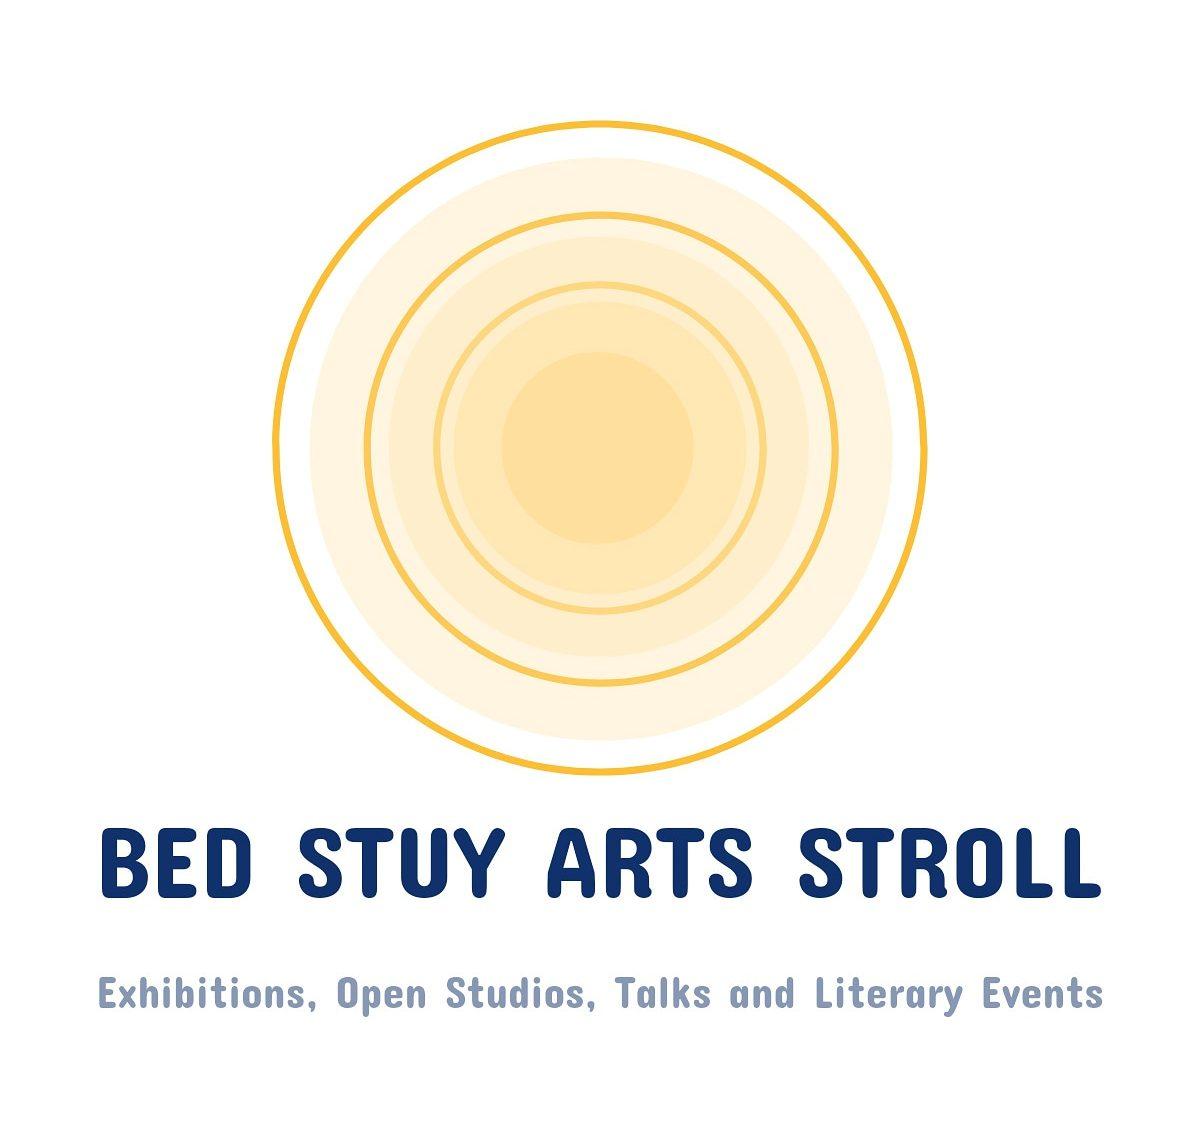 Bed Stuy Arts Stroll